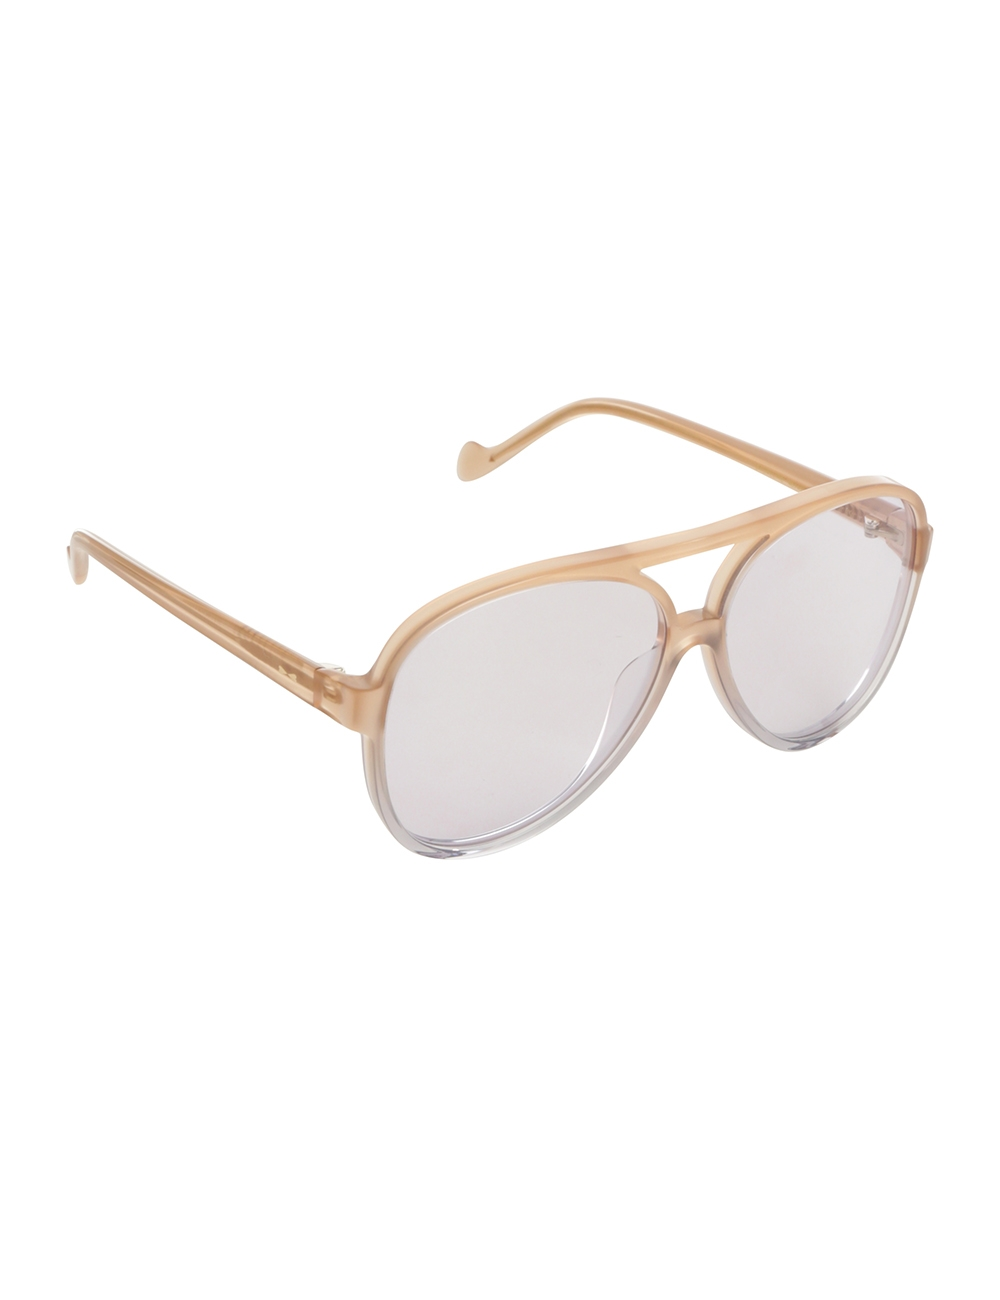 Shoreline Sunglasses